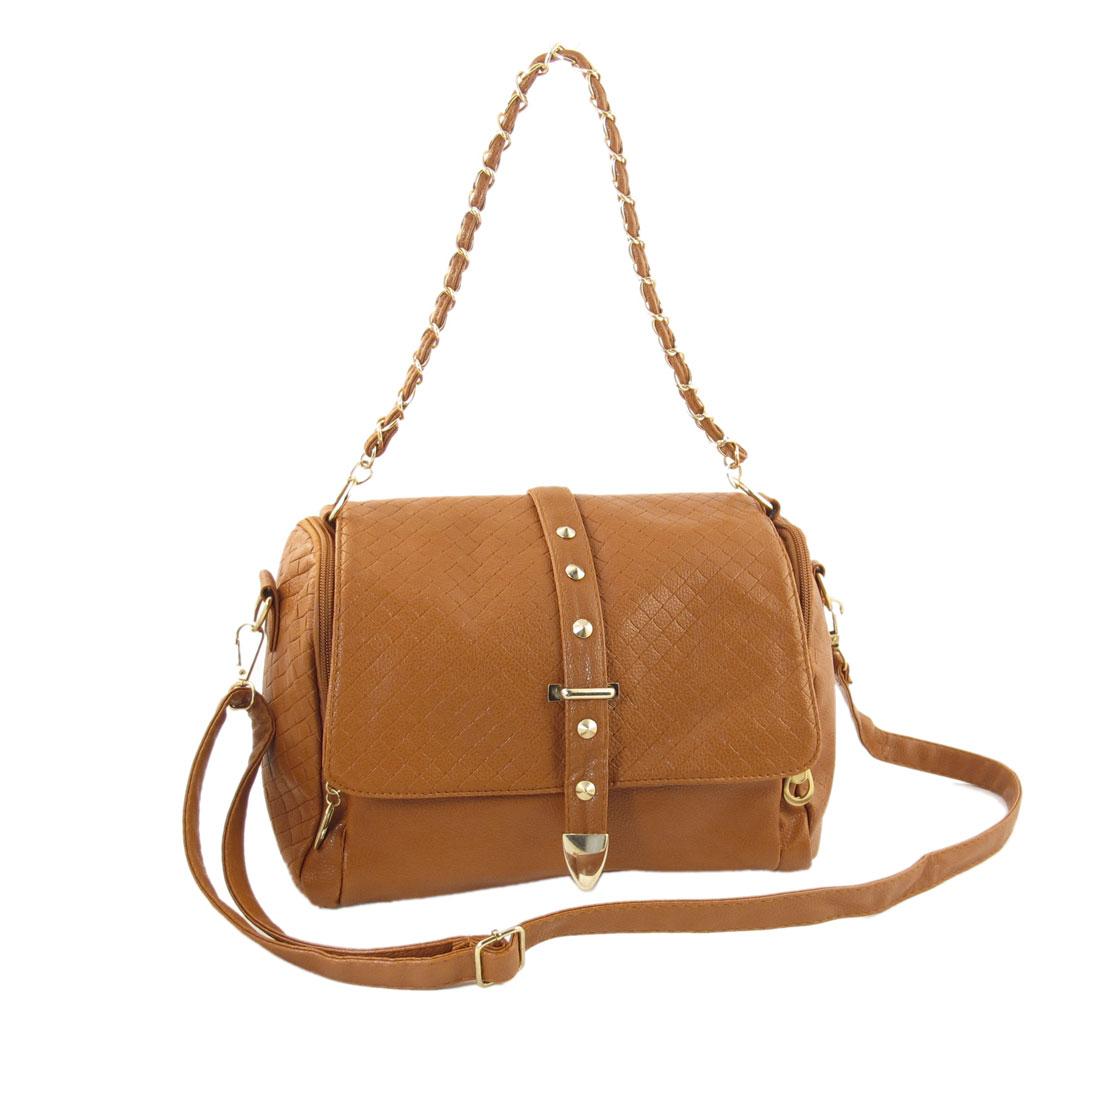 Ladies Brown Faux Leather Braid Pattern Metal Chain Tape Shoulder Bag Handbag